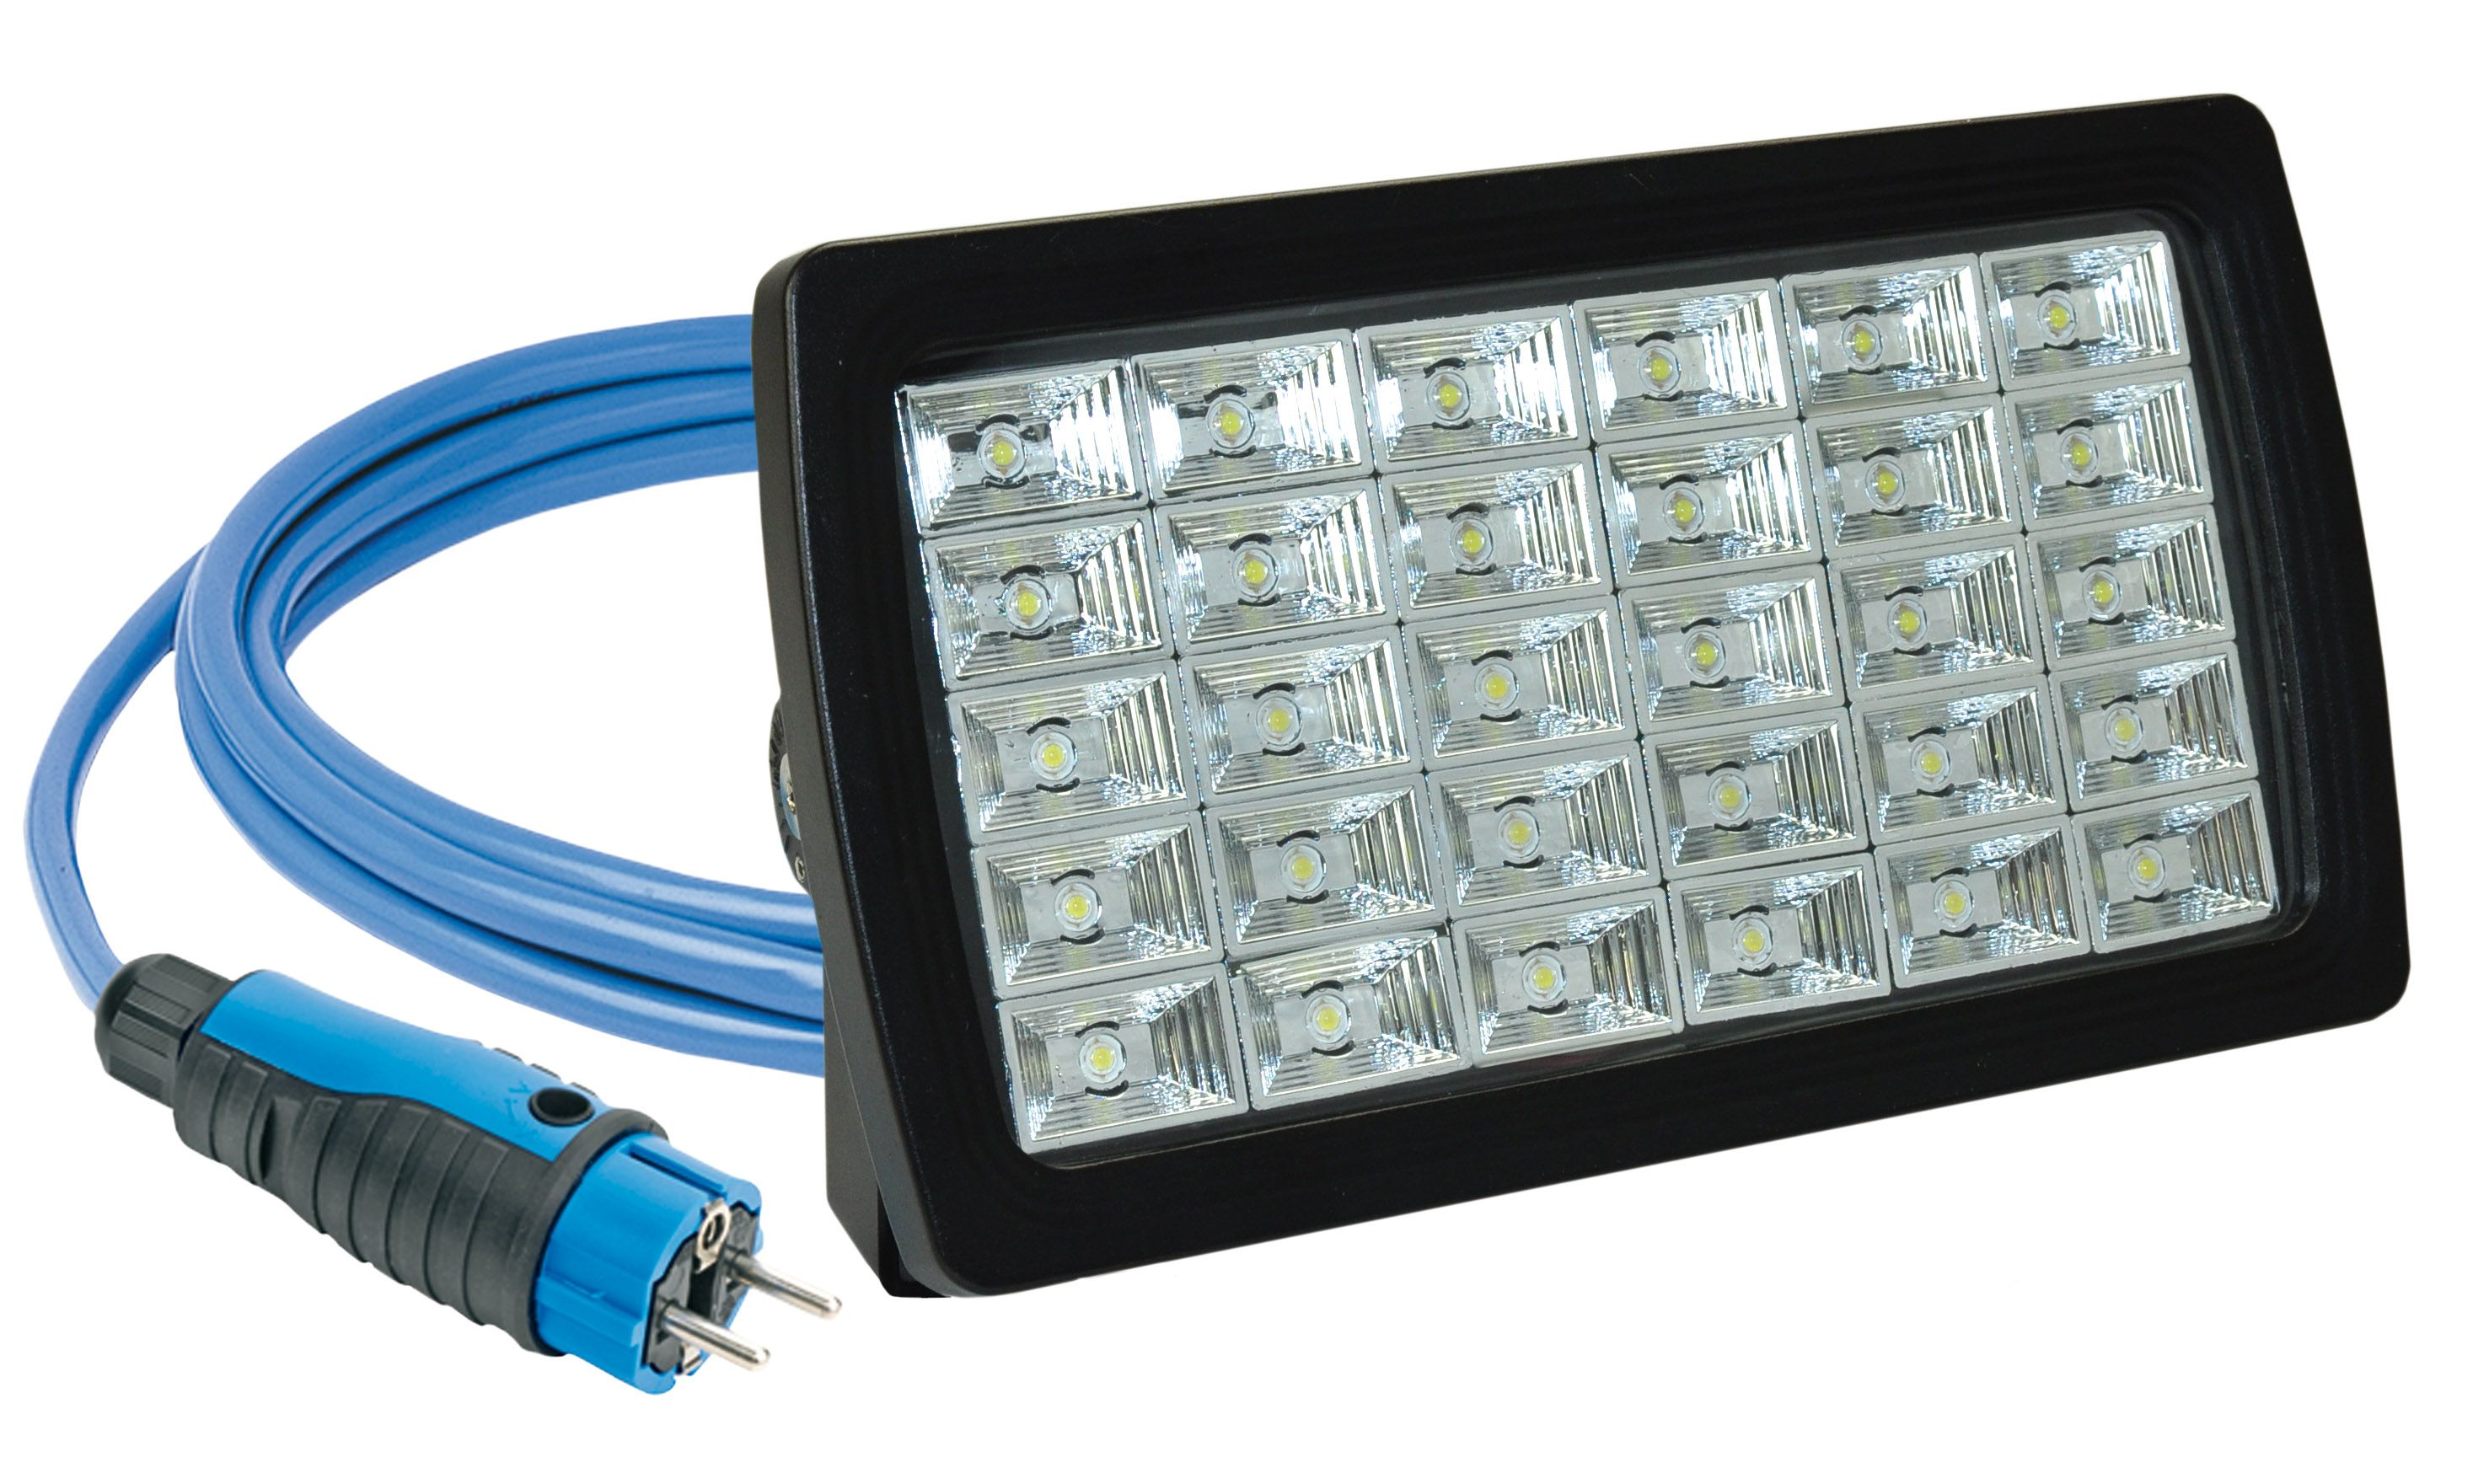 Stoere Energiezuinige Lampen : W led straler energiezuinige led armaturen en lampen